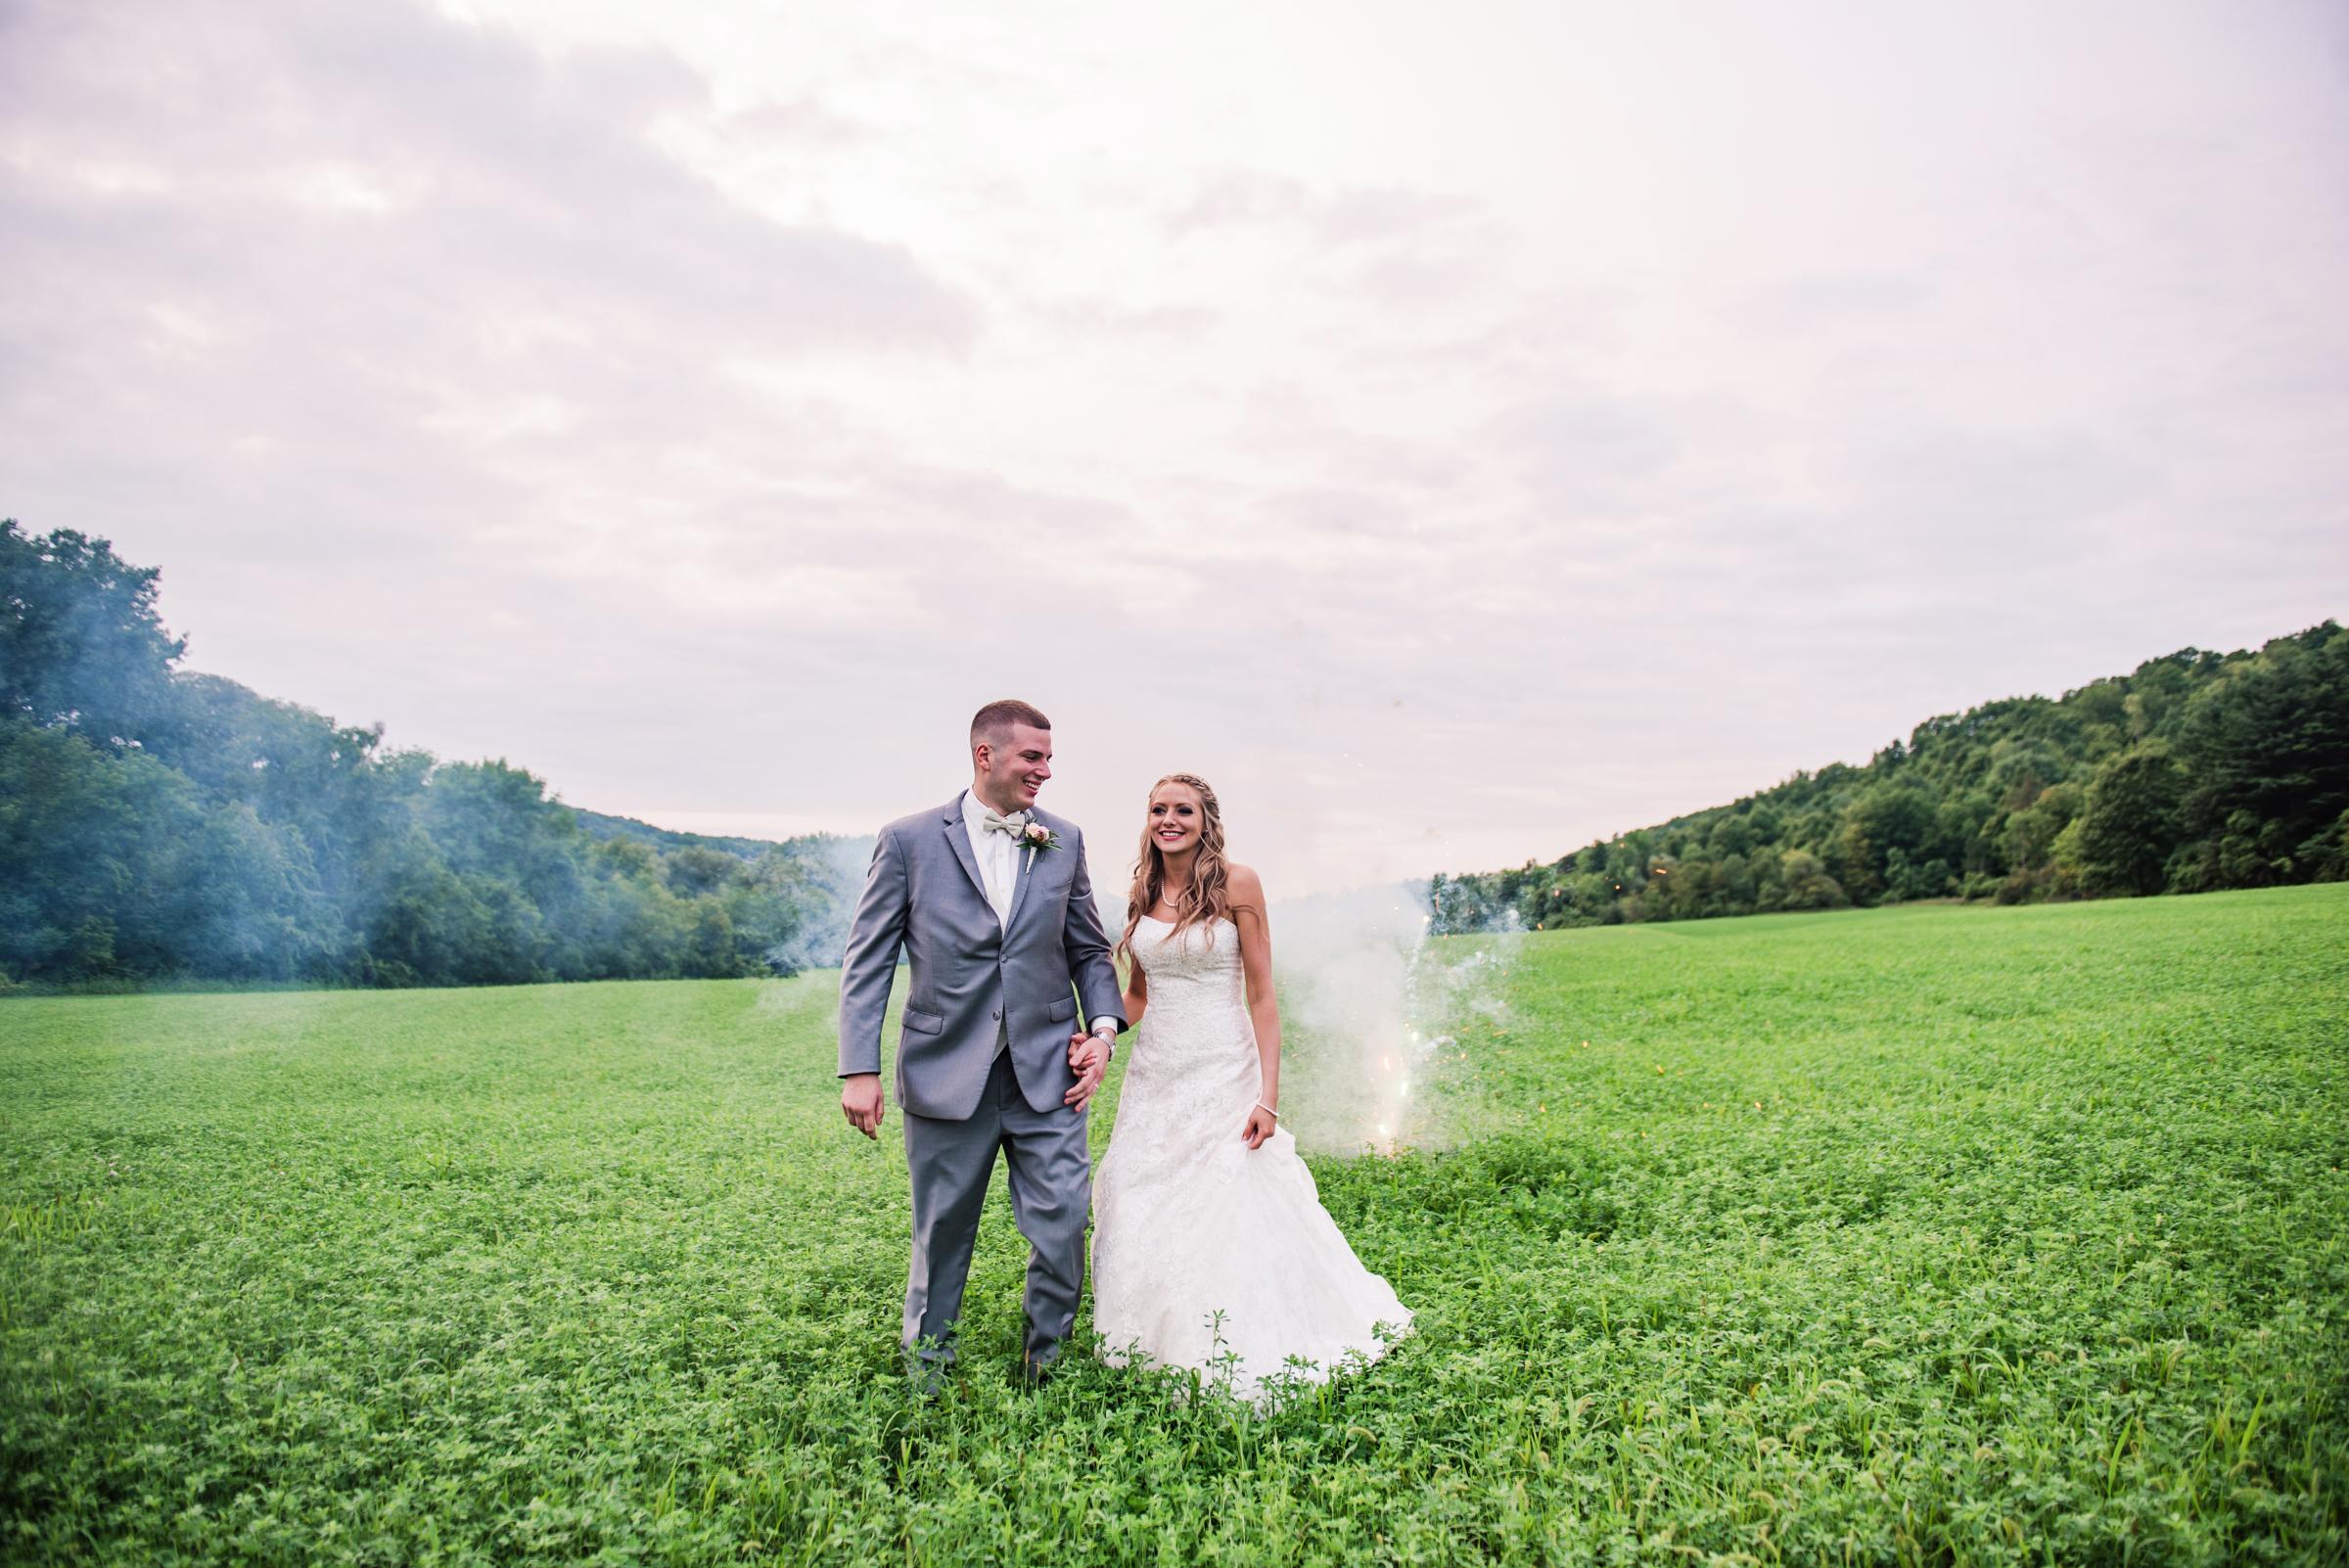 Wolf_Oak_Acres_Central_NY_Wedding_JILL_STUDIO_Rochester_NY_Photographer_DSC_8968.jpg